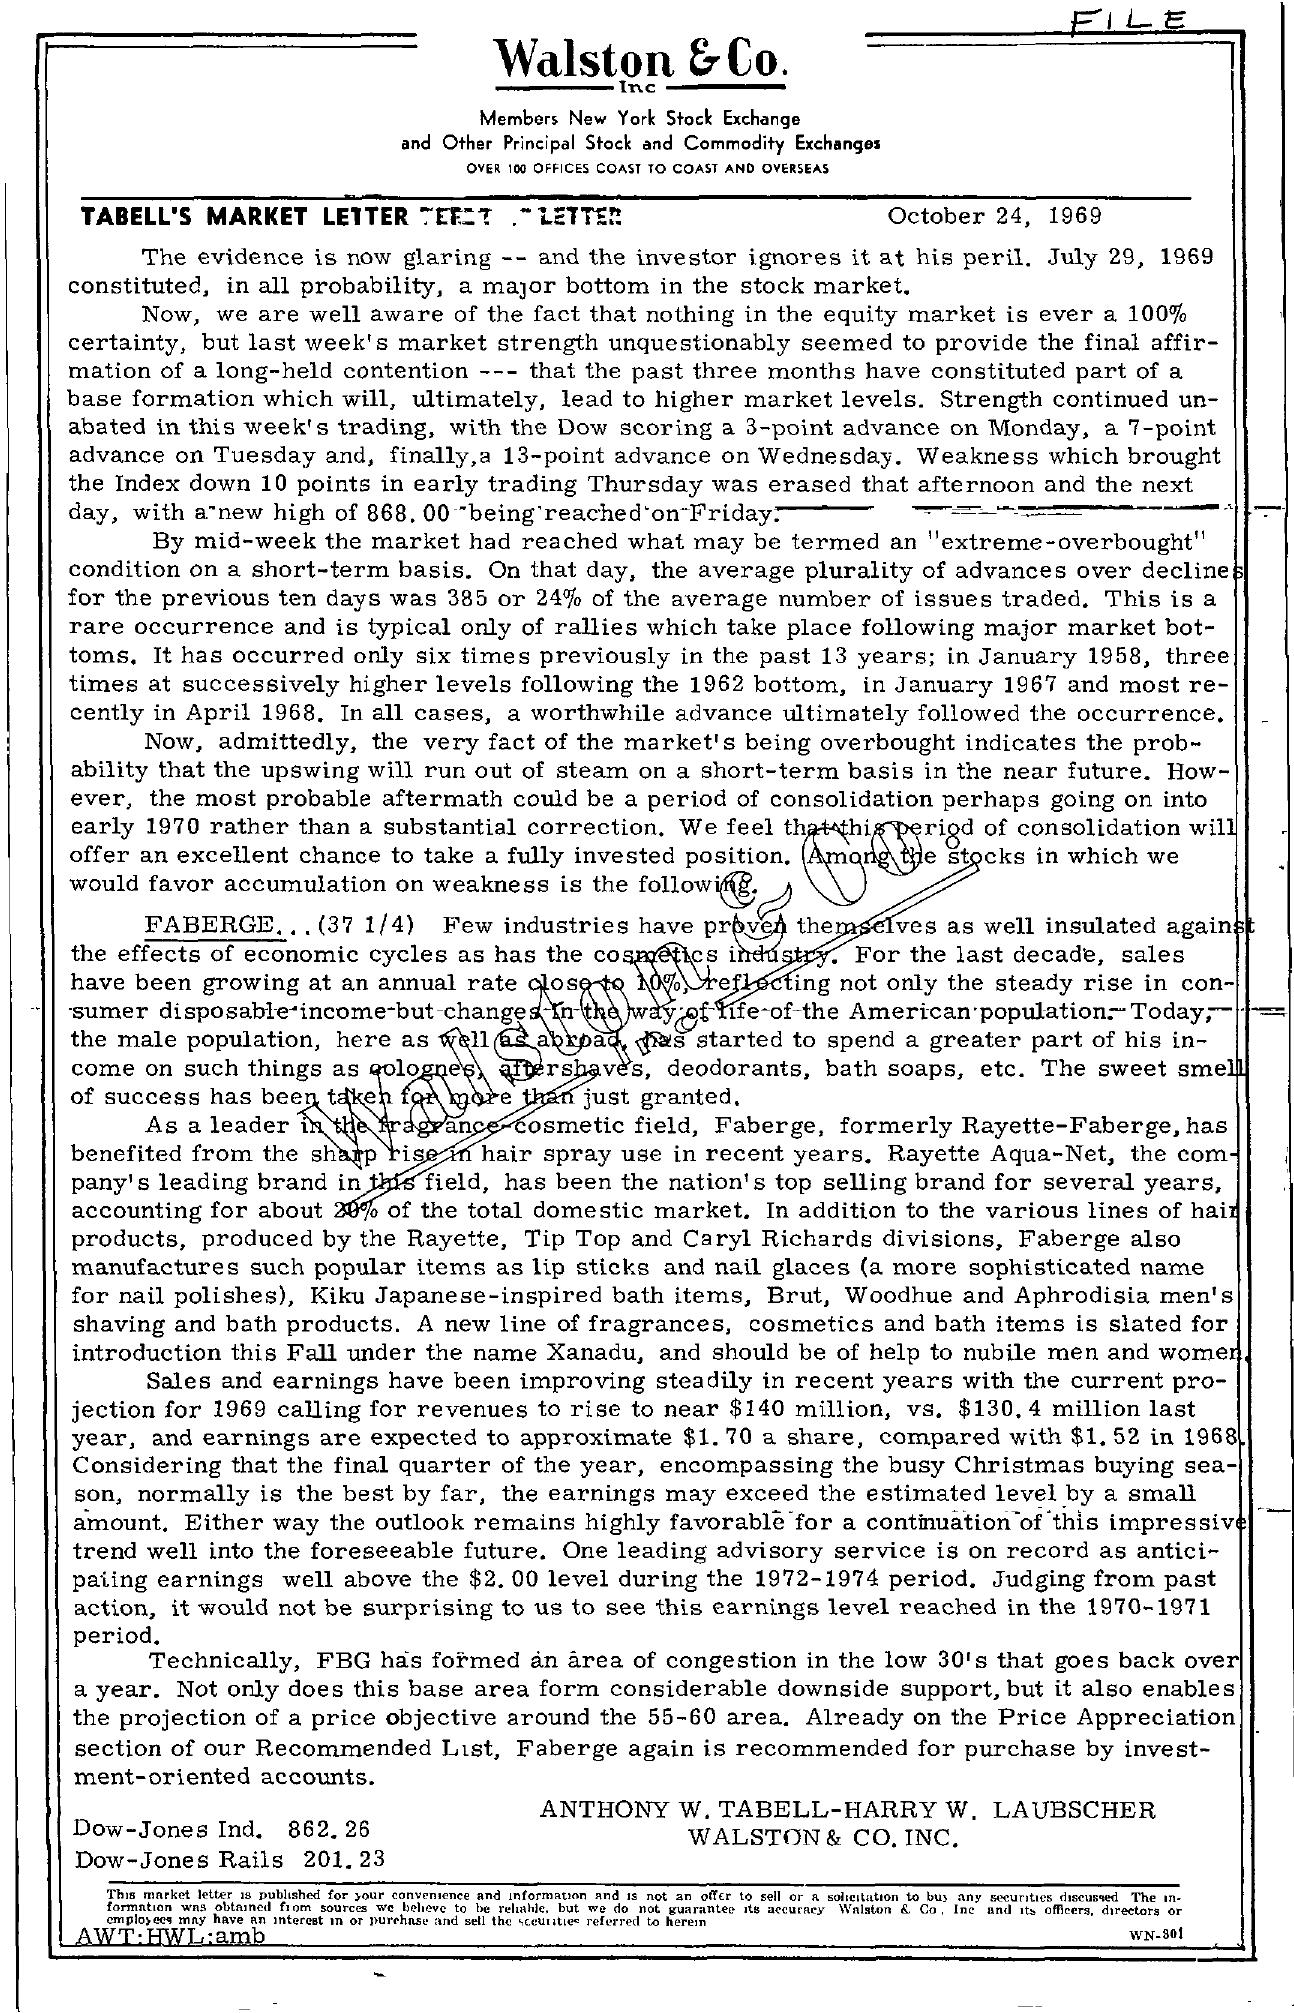 Tabell's Market Letter - October 24, 1969